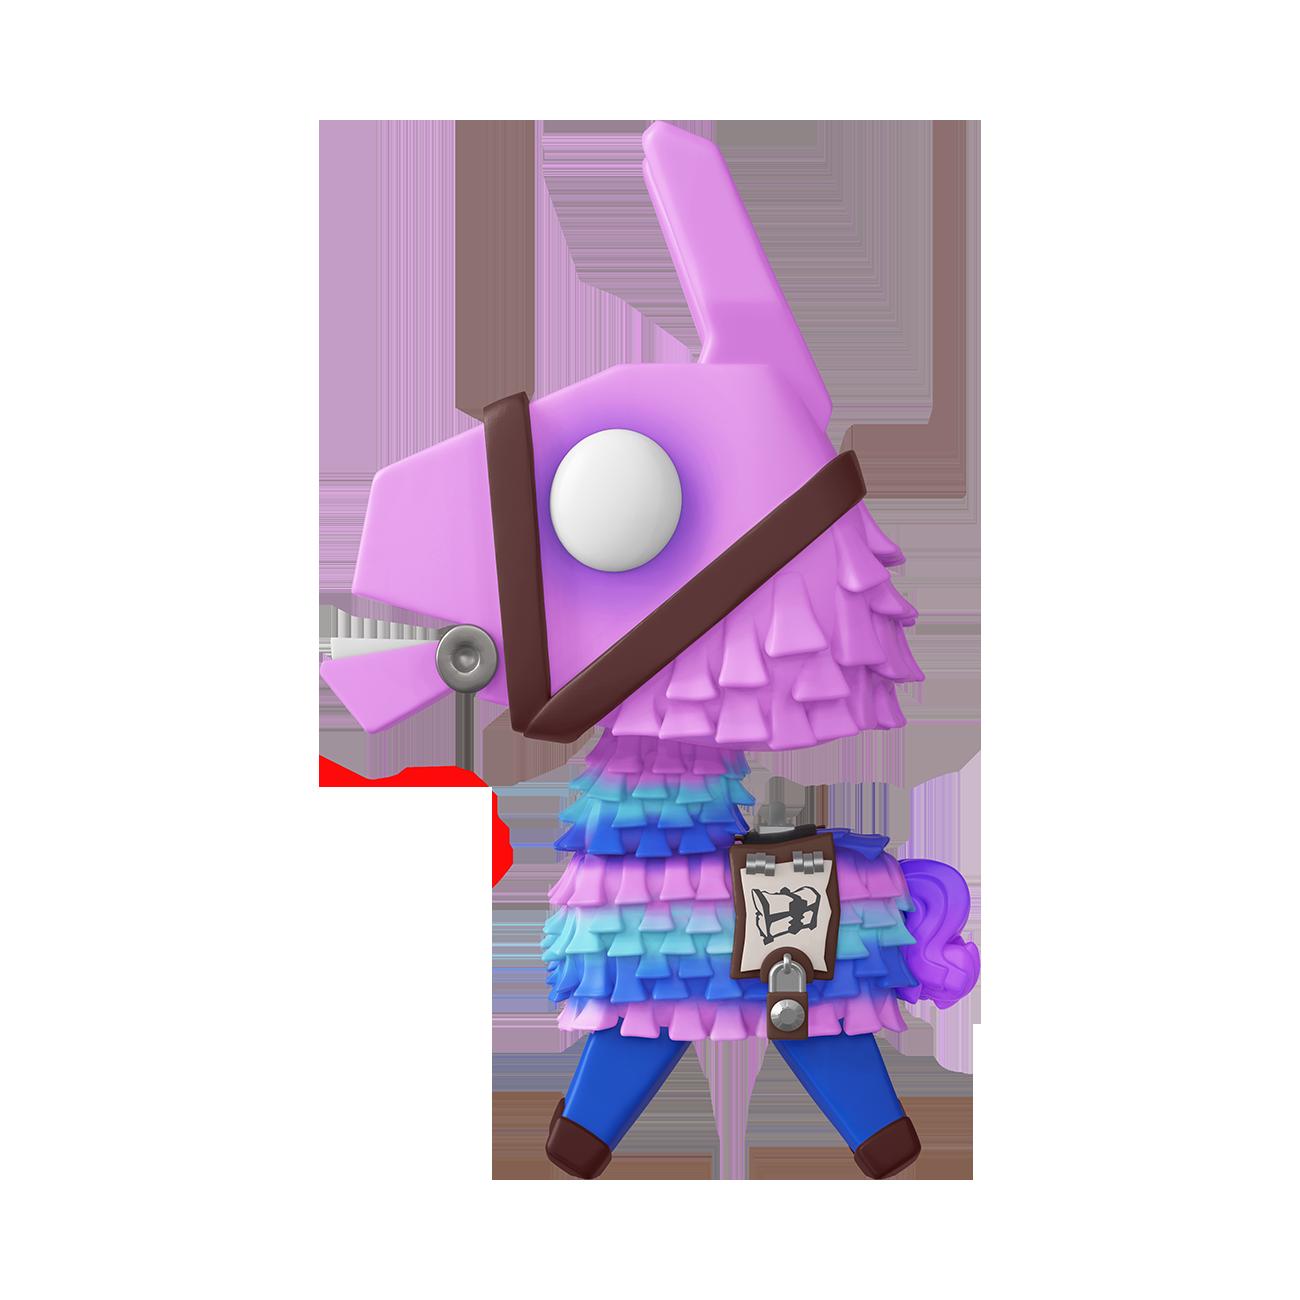 10 Loot Llama Fortnite In 2021 Fortnite Funko Pop Funko